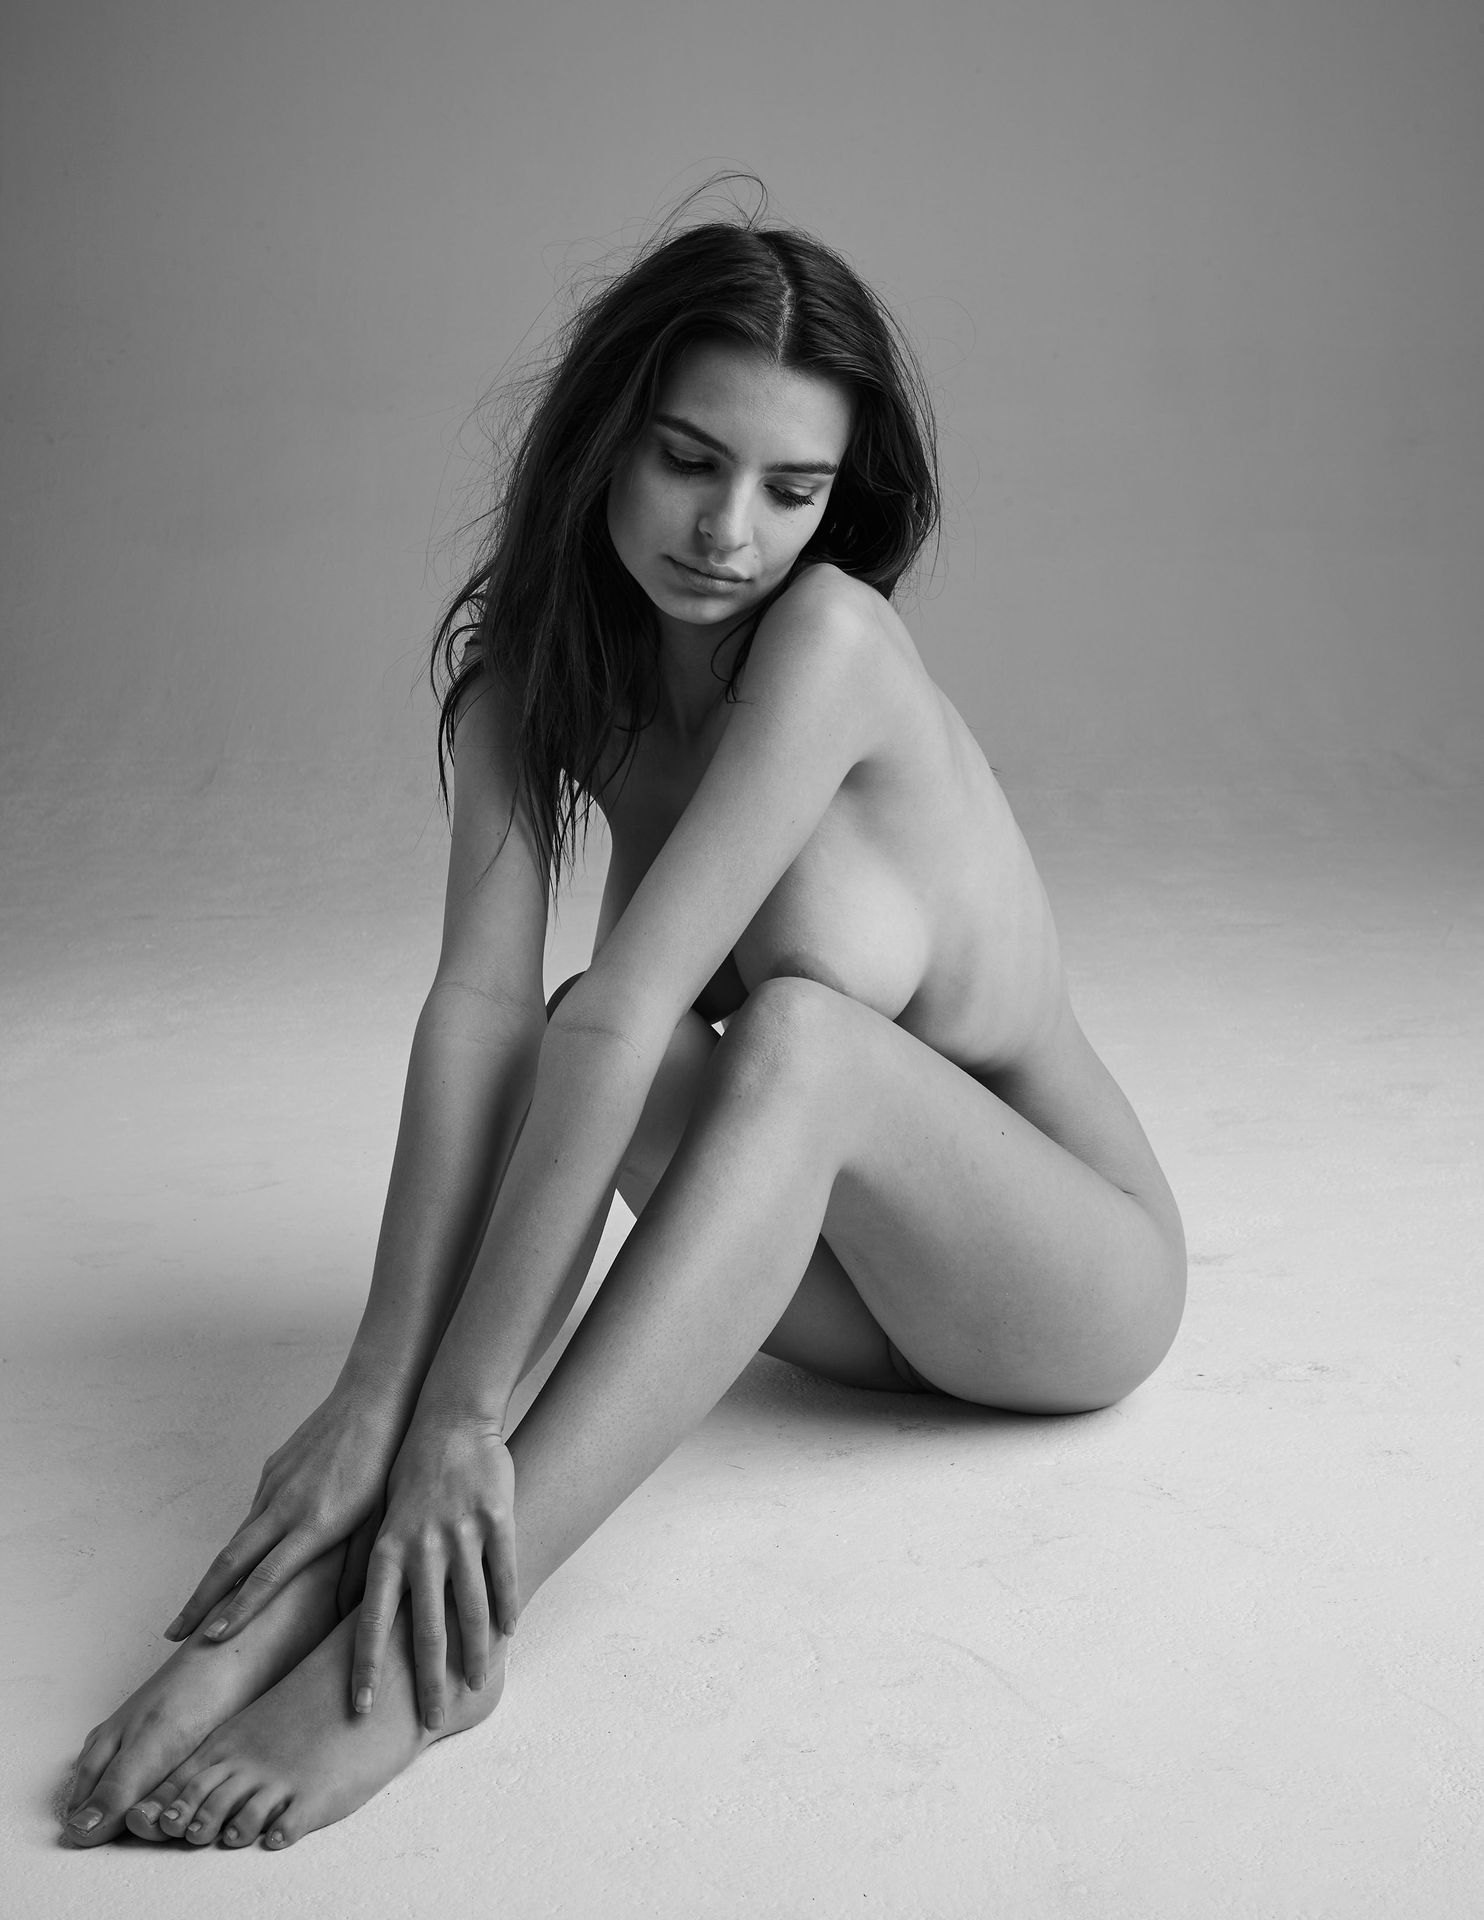 5Emily-Ratajkowski-Nude-10-thefappeningblog.com_.jpg